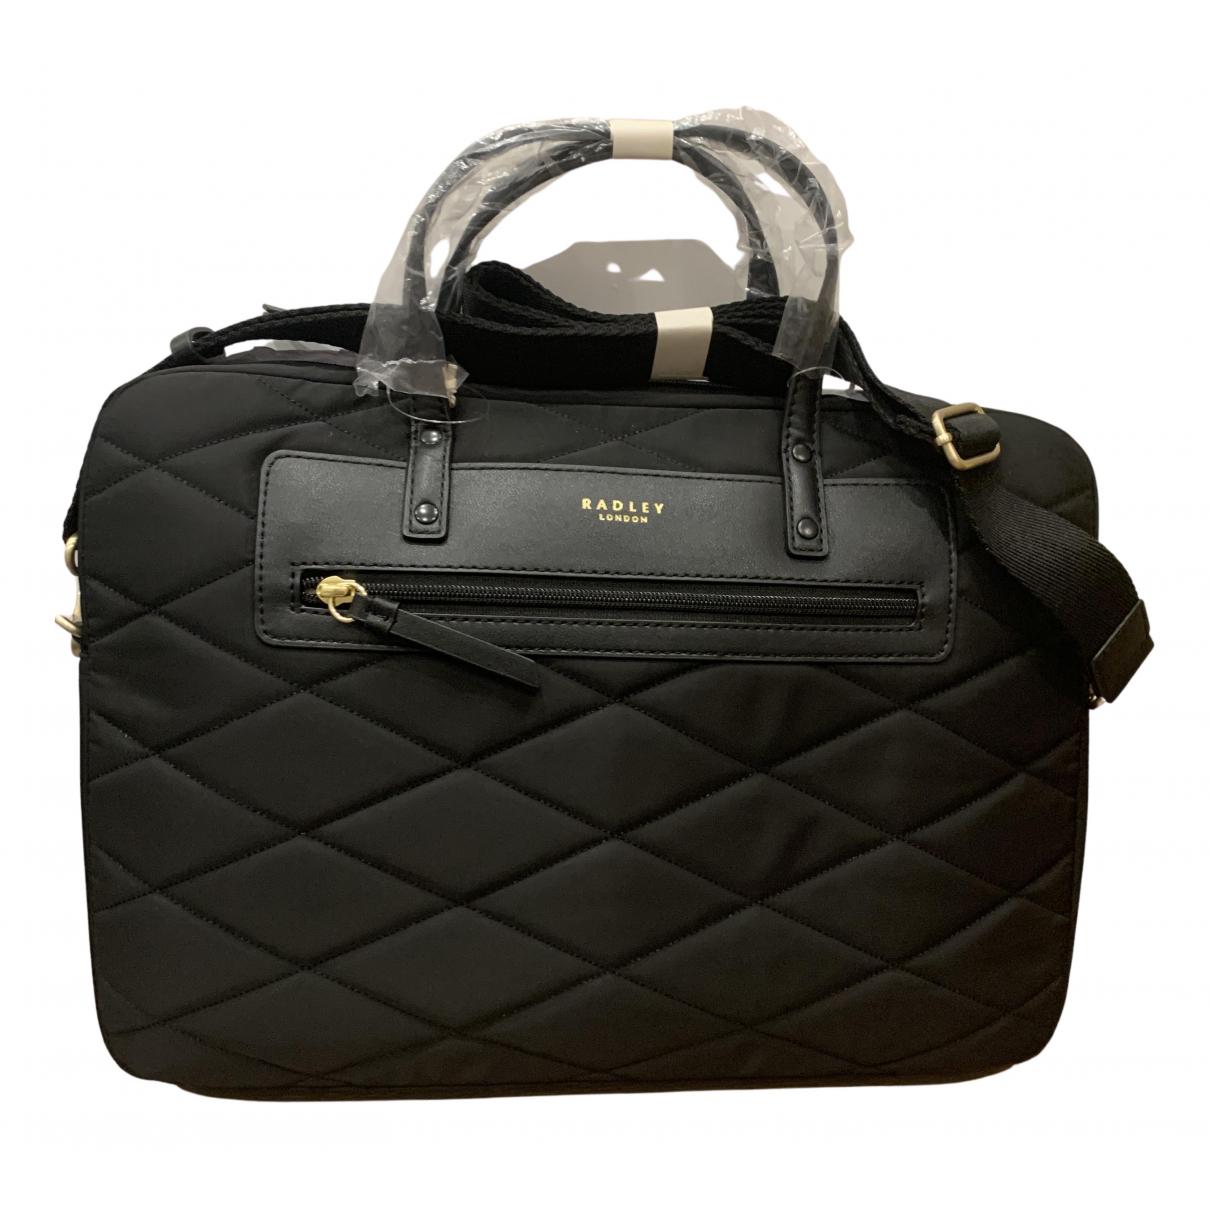 Radley London N Black Cloth handbag for Women N